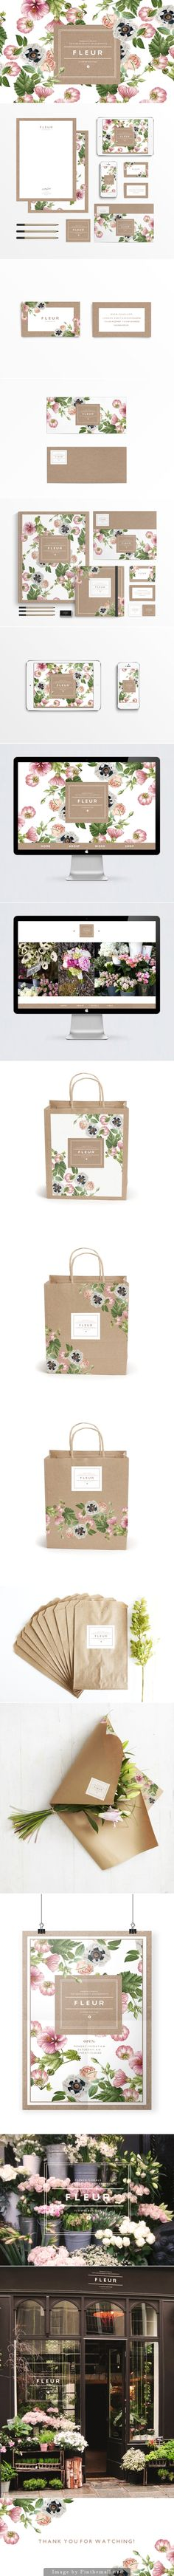 How beautiful is Fleur #identity #packaging #branding curated by Packaging Diva PD created via https://www.behance.net/gallery/15892001/F-L-E-U-R